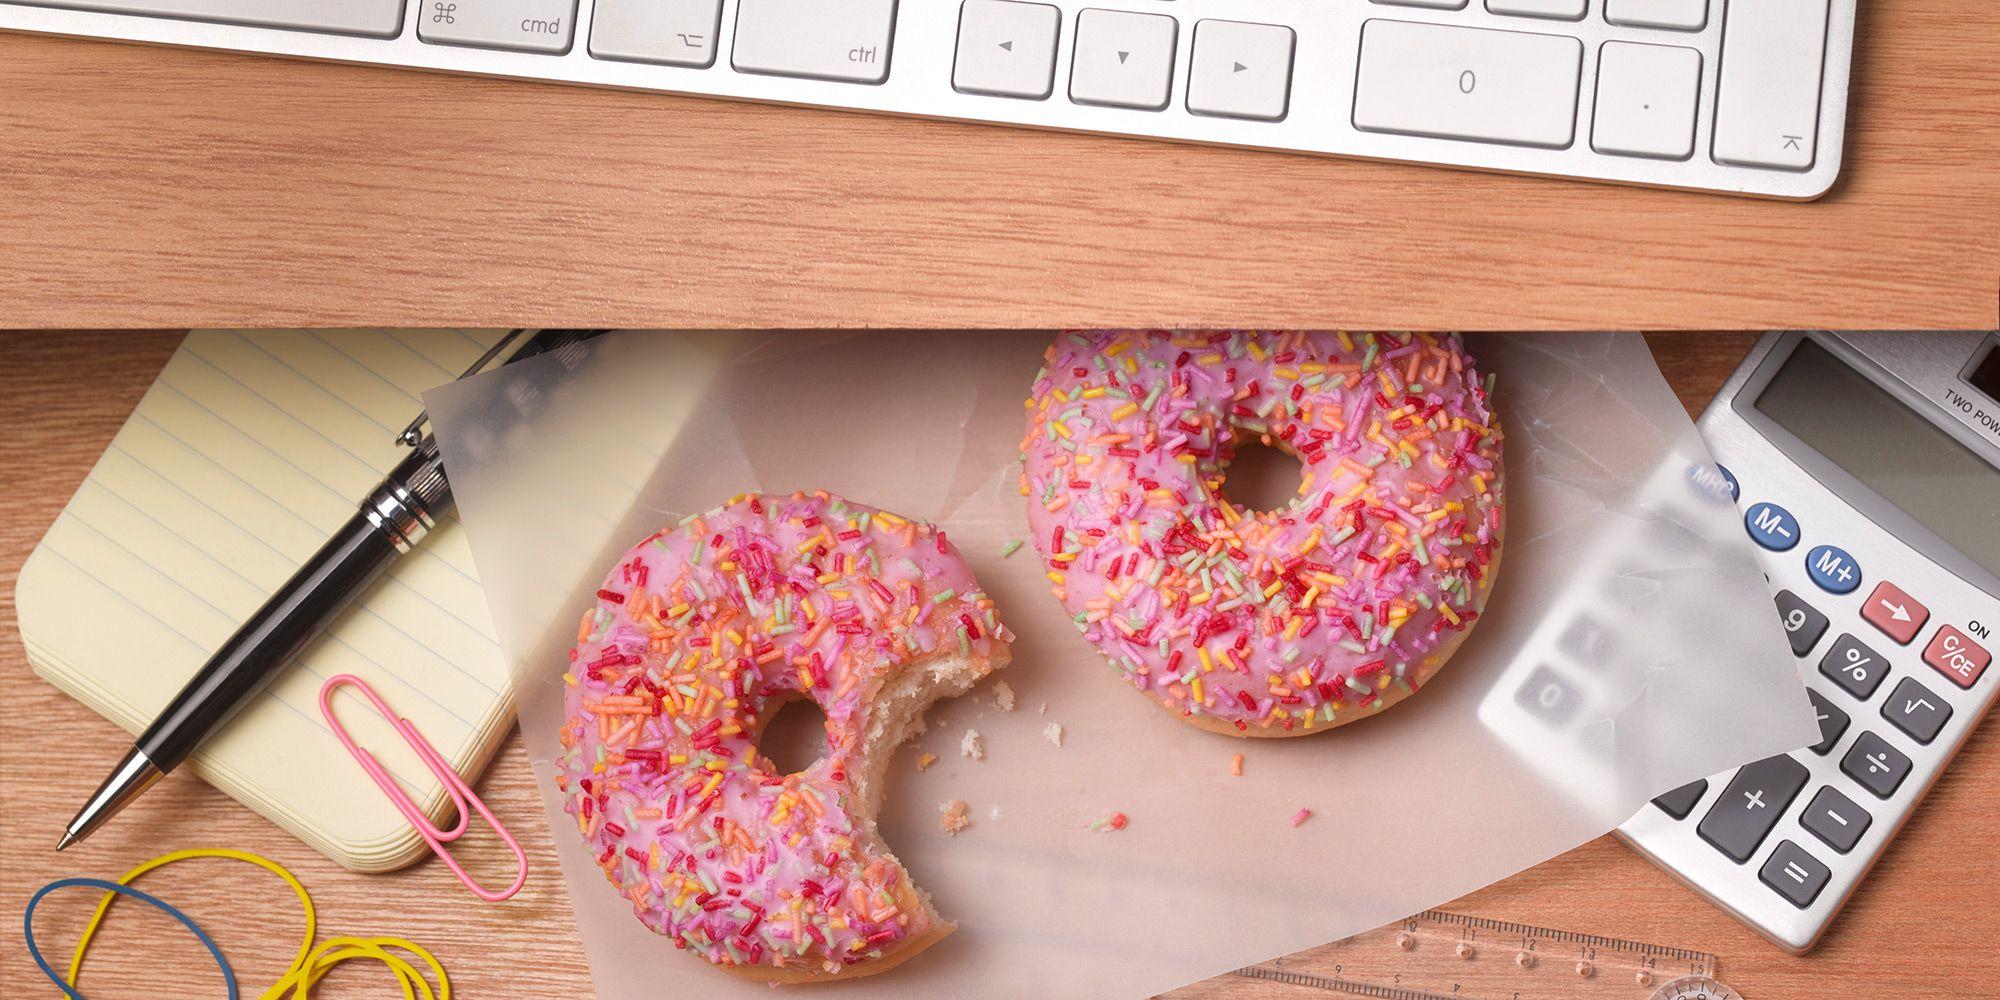 doughnut, snacking